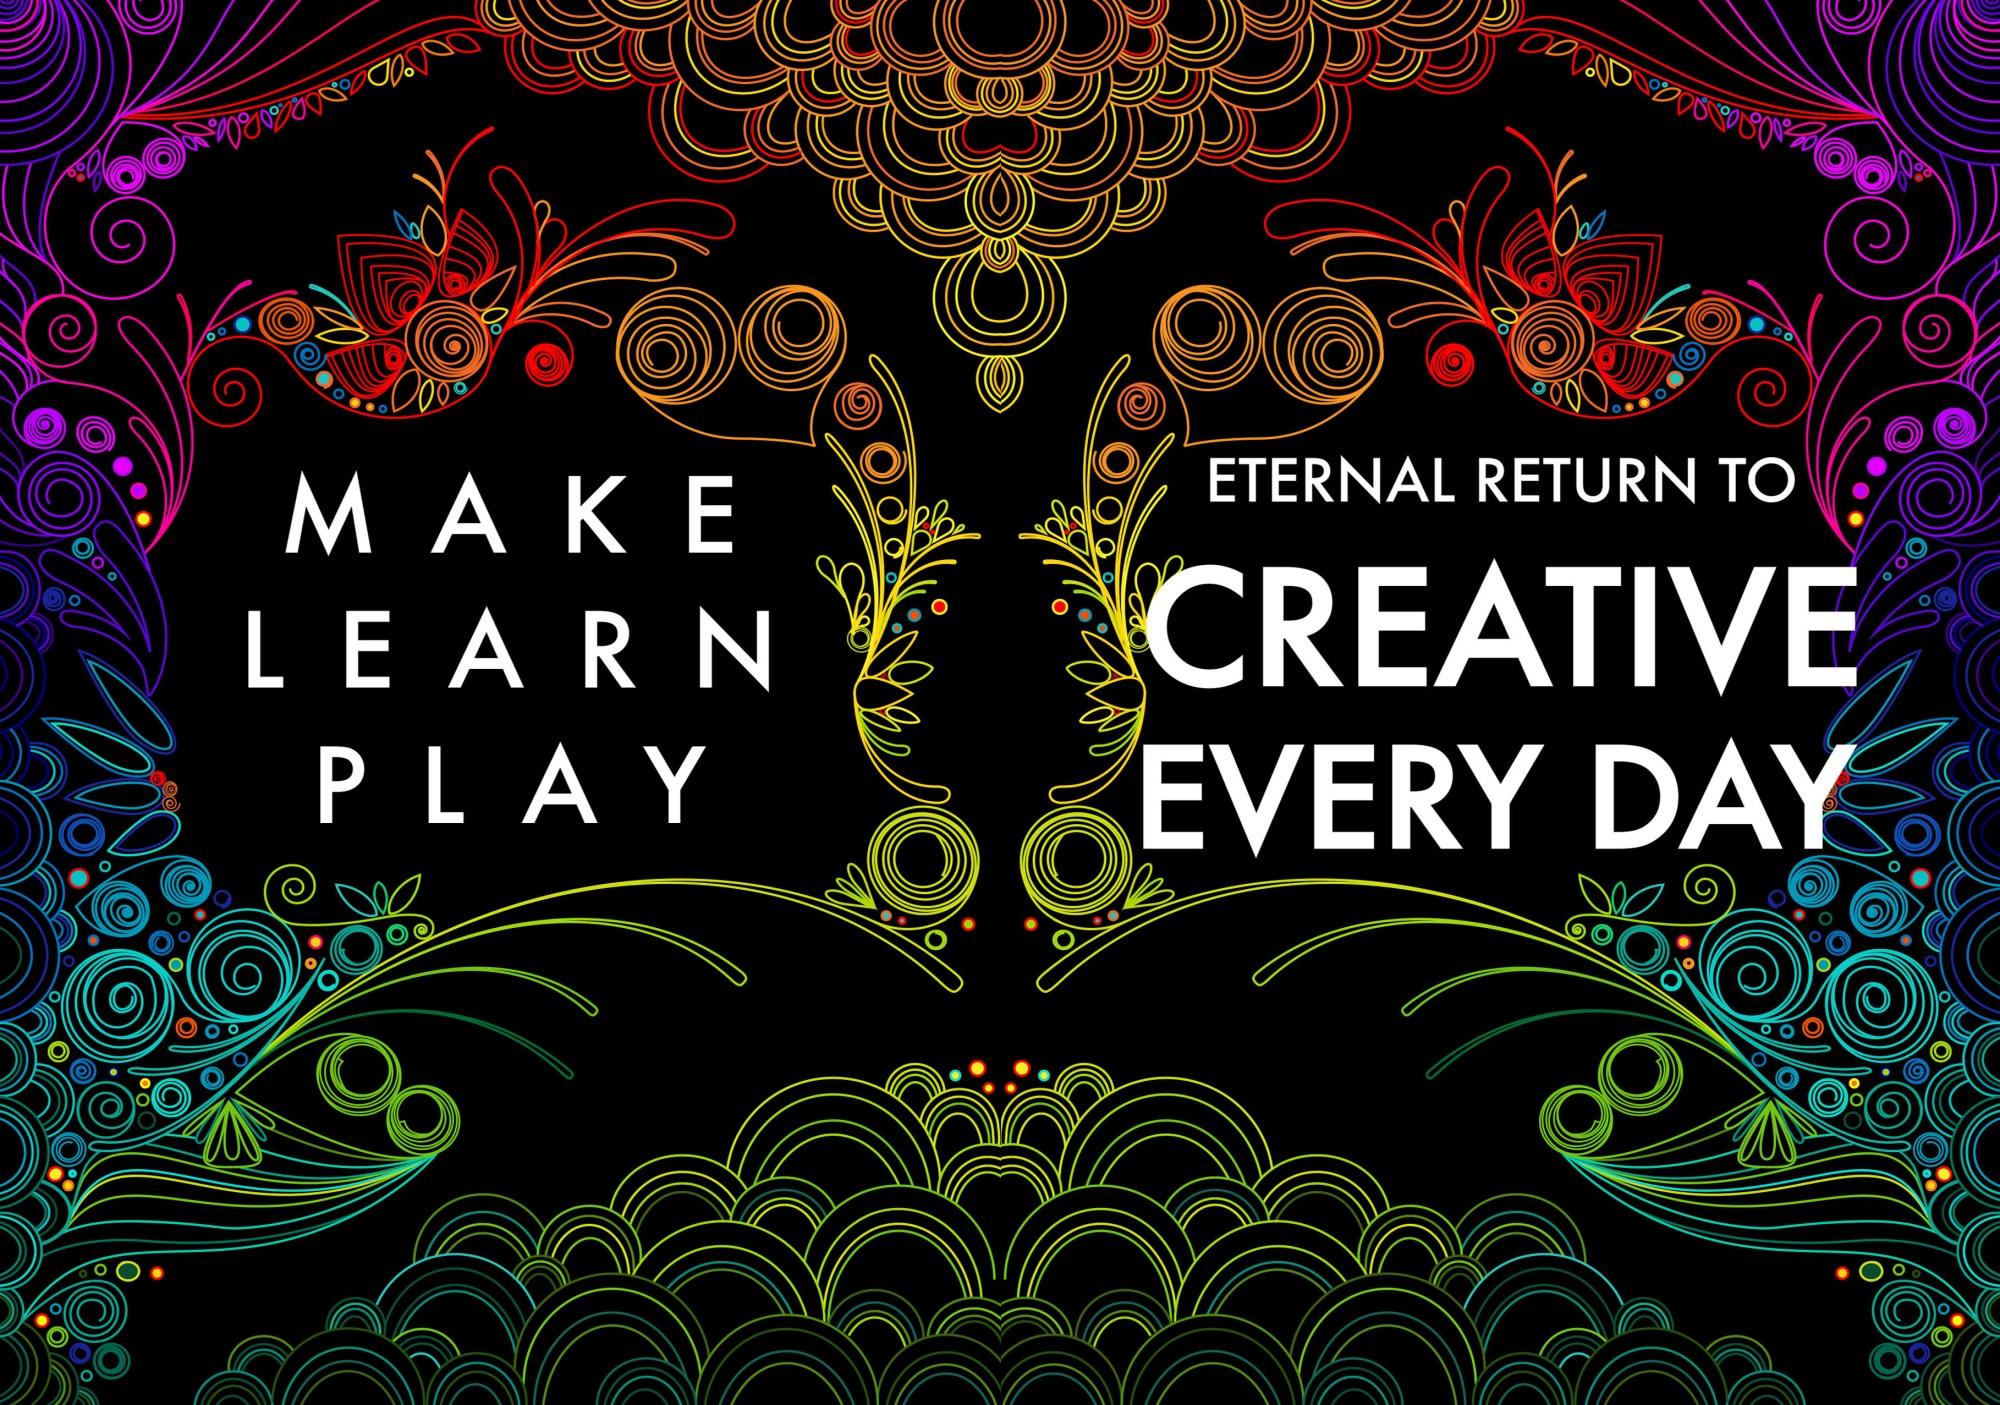 Eternal Return to Creative Everyday